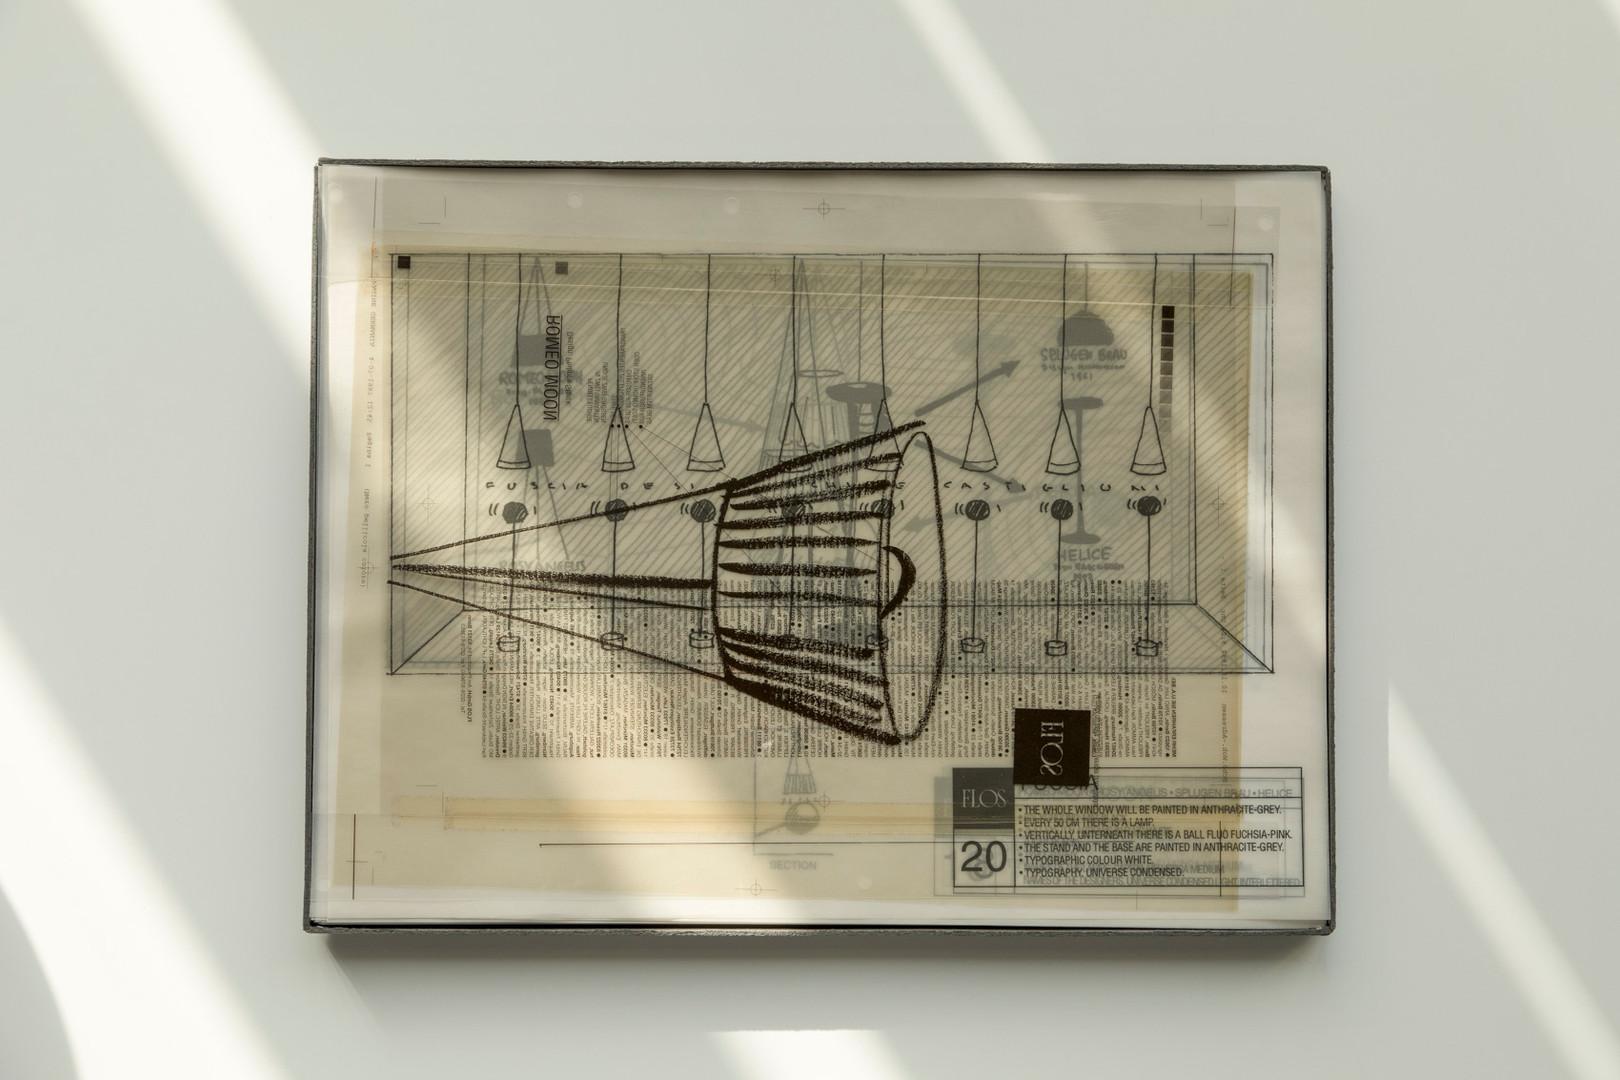 Flos Archive by Alecio Ferrari-14.jpg